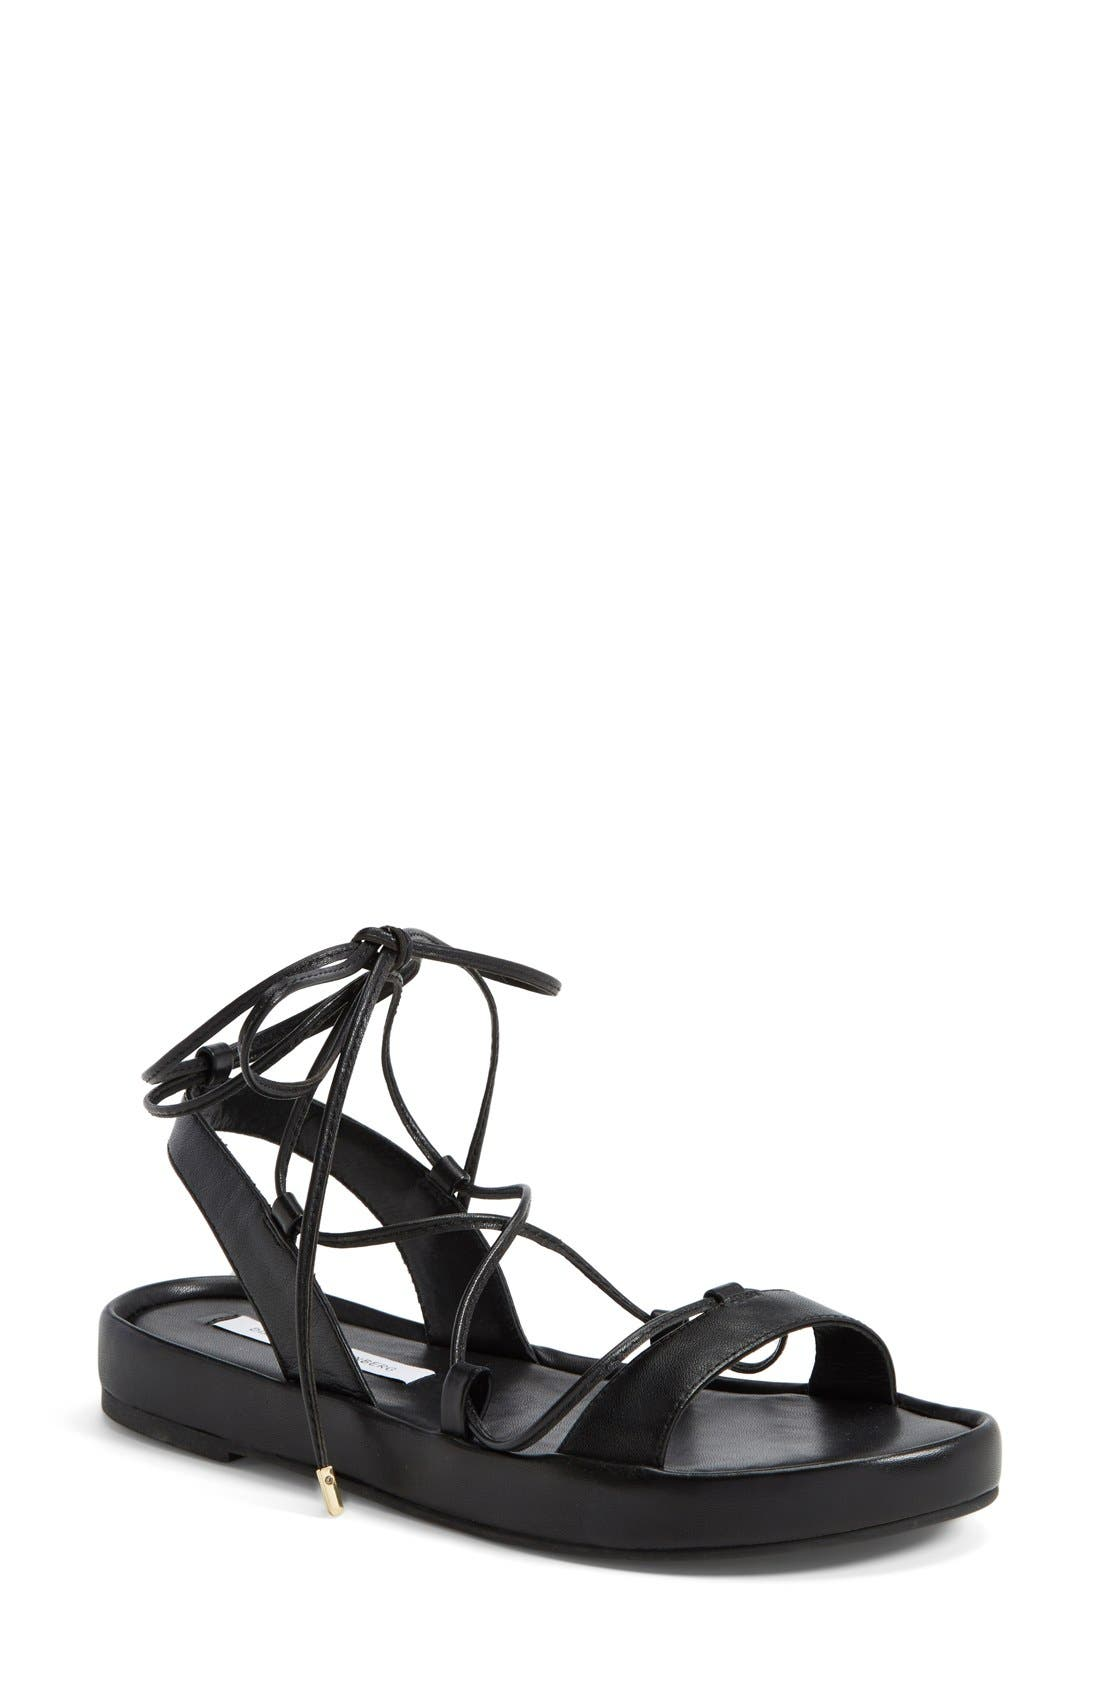 Alternate Image 1 Selected - Diane von Furstenberg 'Susie' Gladiator Sandal (Women)